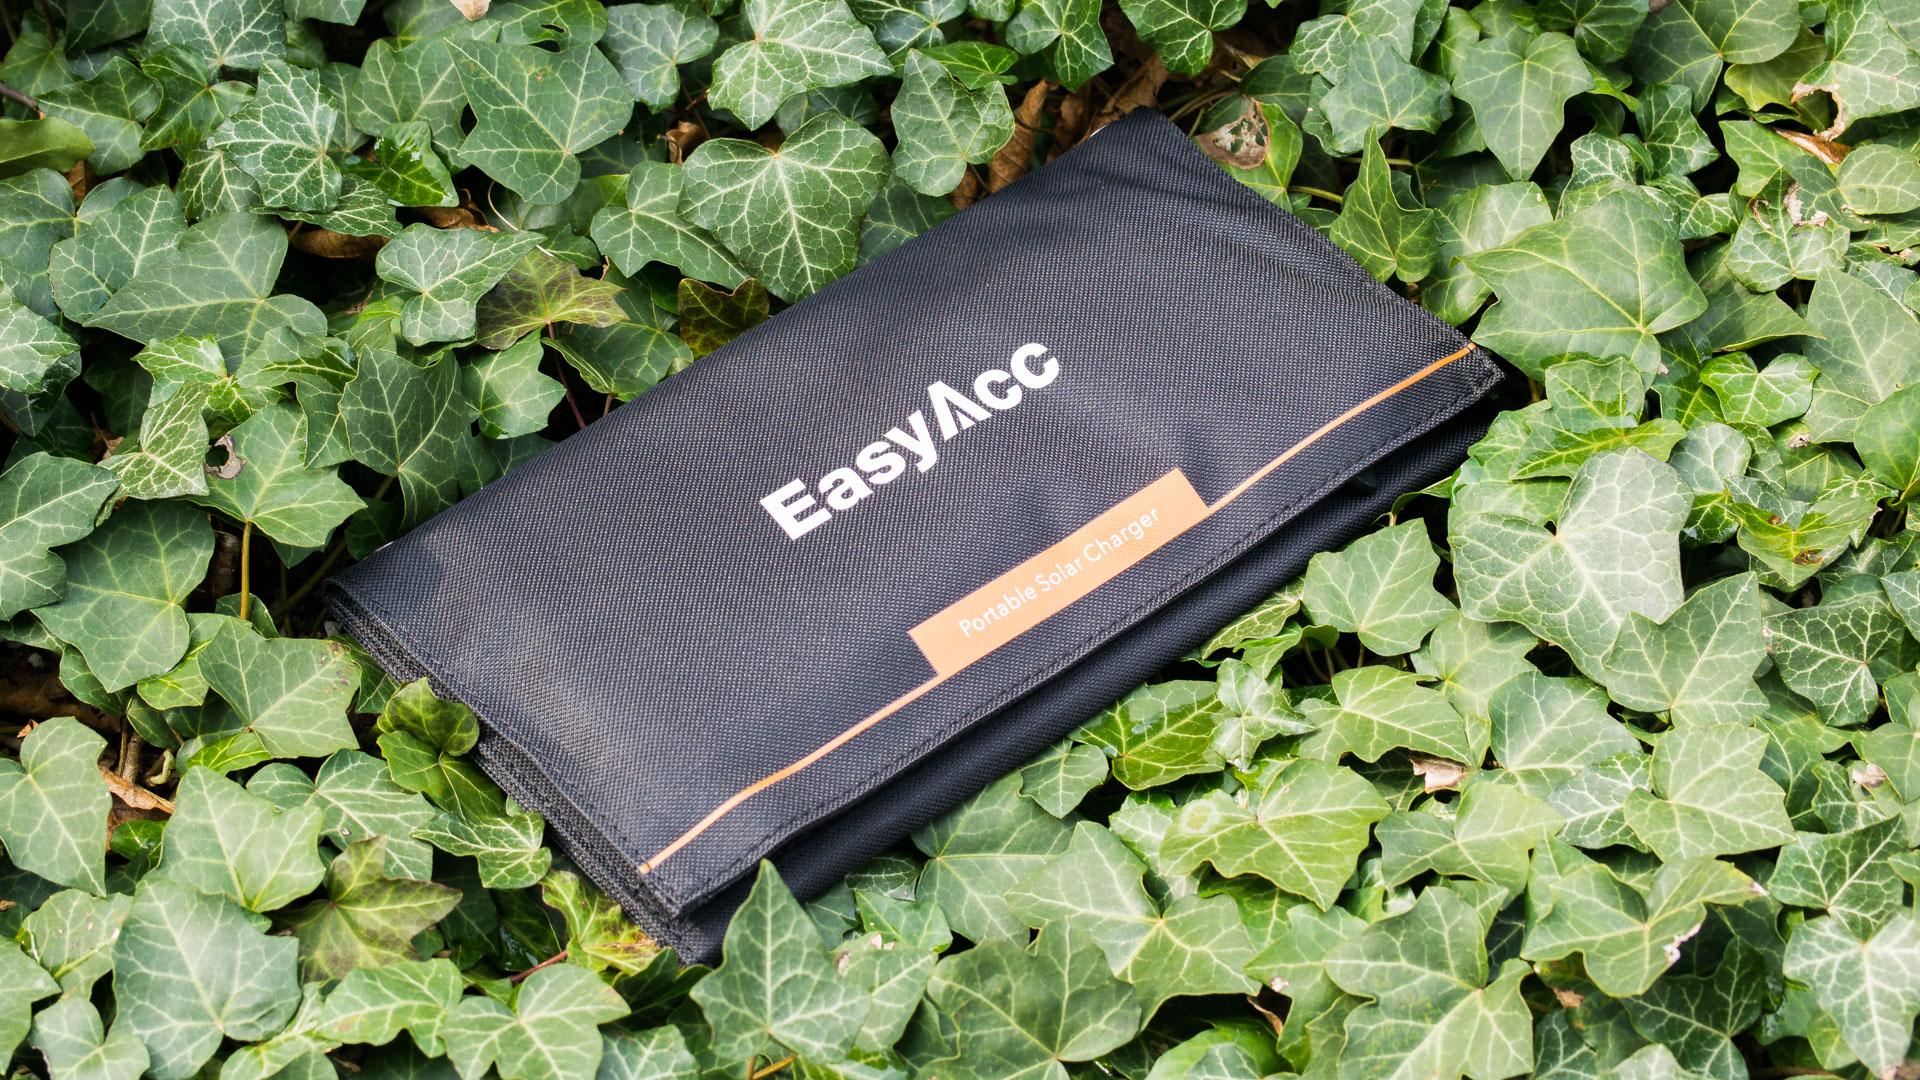 easyacc solar ladeger t 2 port mit 15w leistung im test. Black Bedroom Furniture Sets. Home Design Ideas